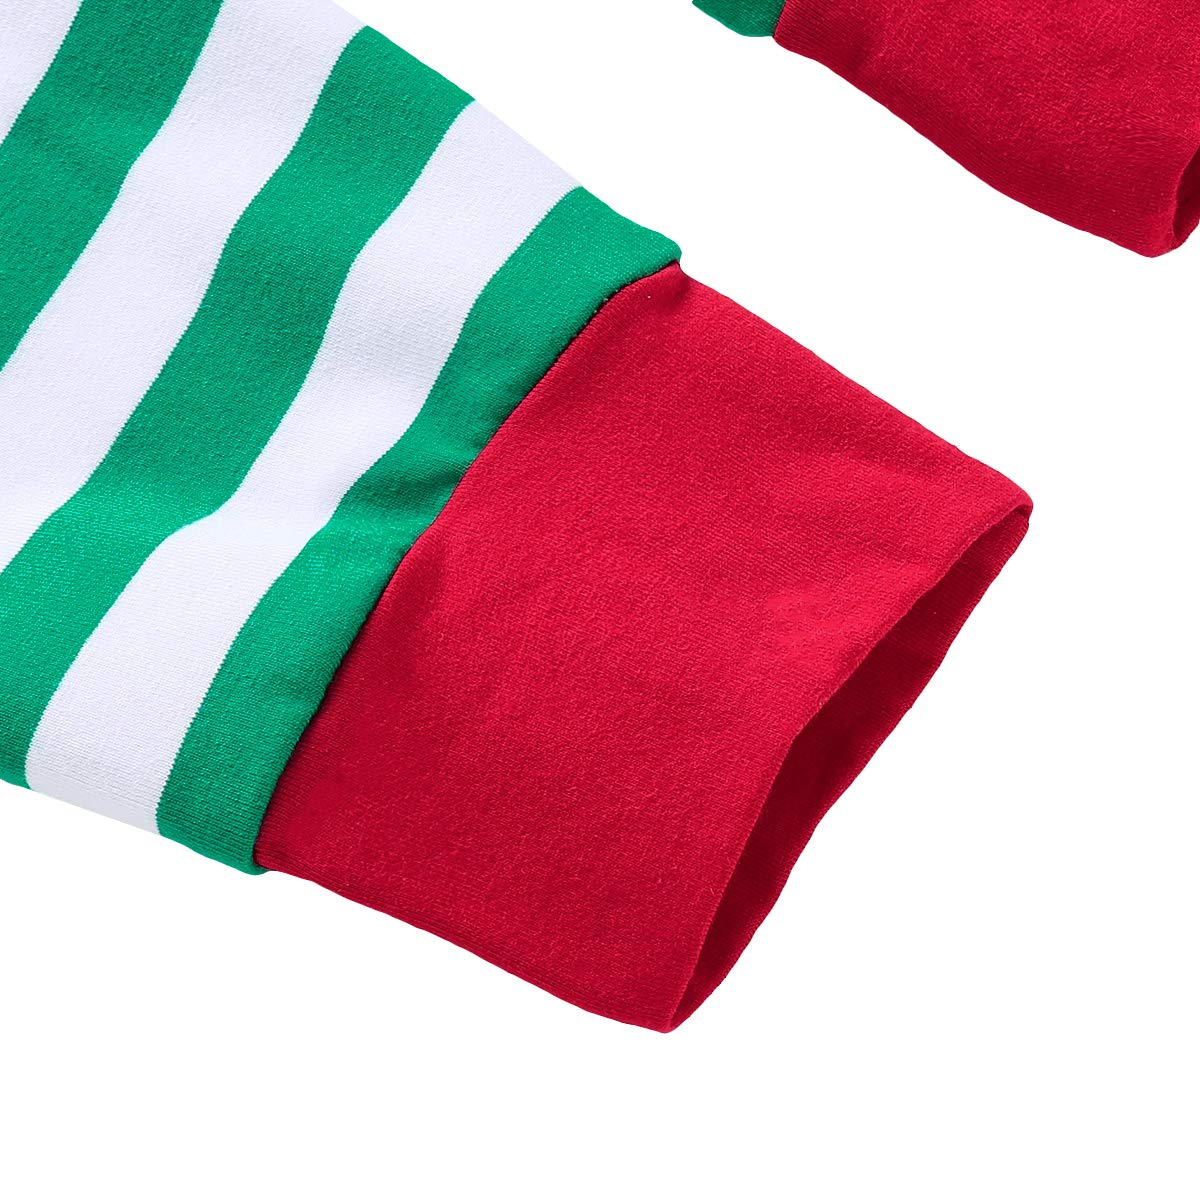 Mikrdoo Family Matching Christmas Pajamas Sleepwear Letter Print Striped PJs Set